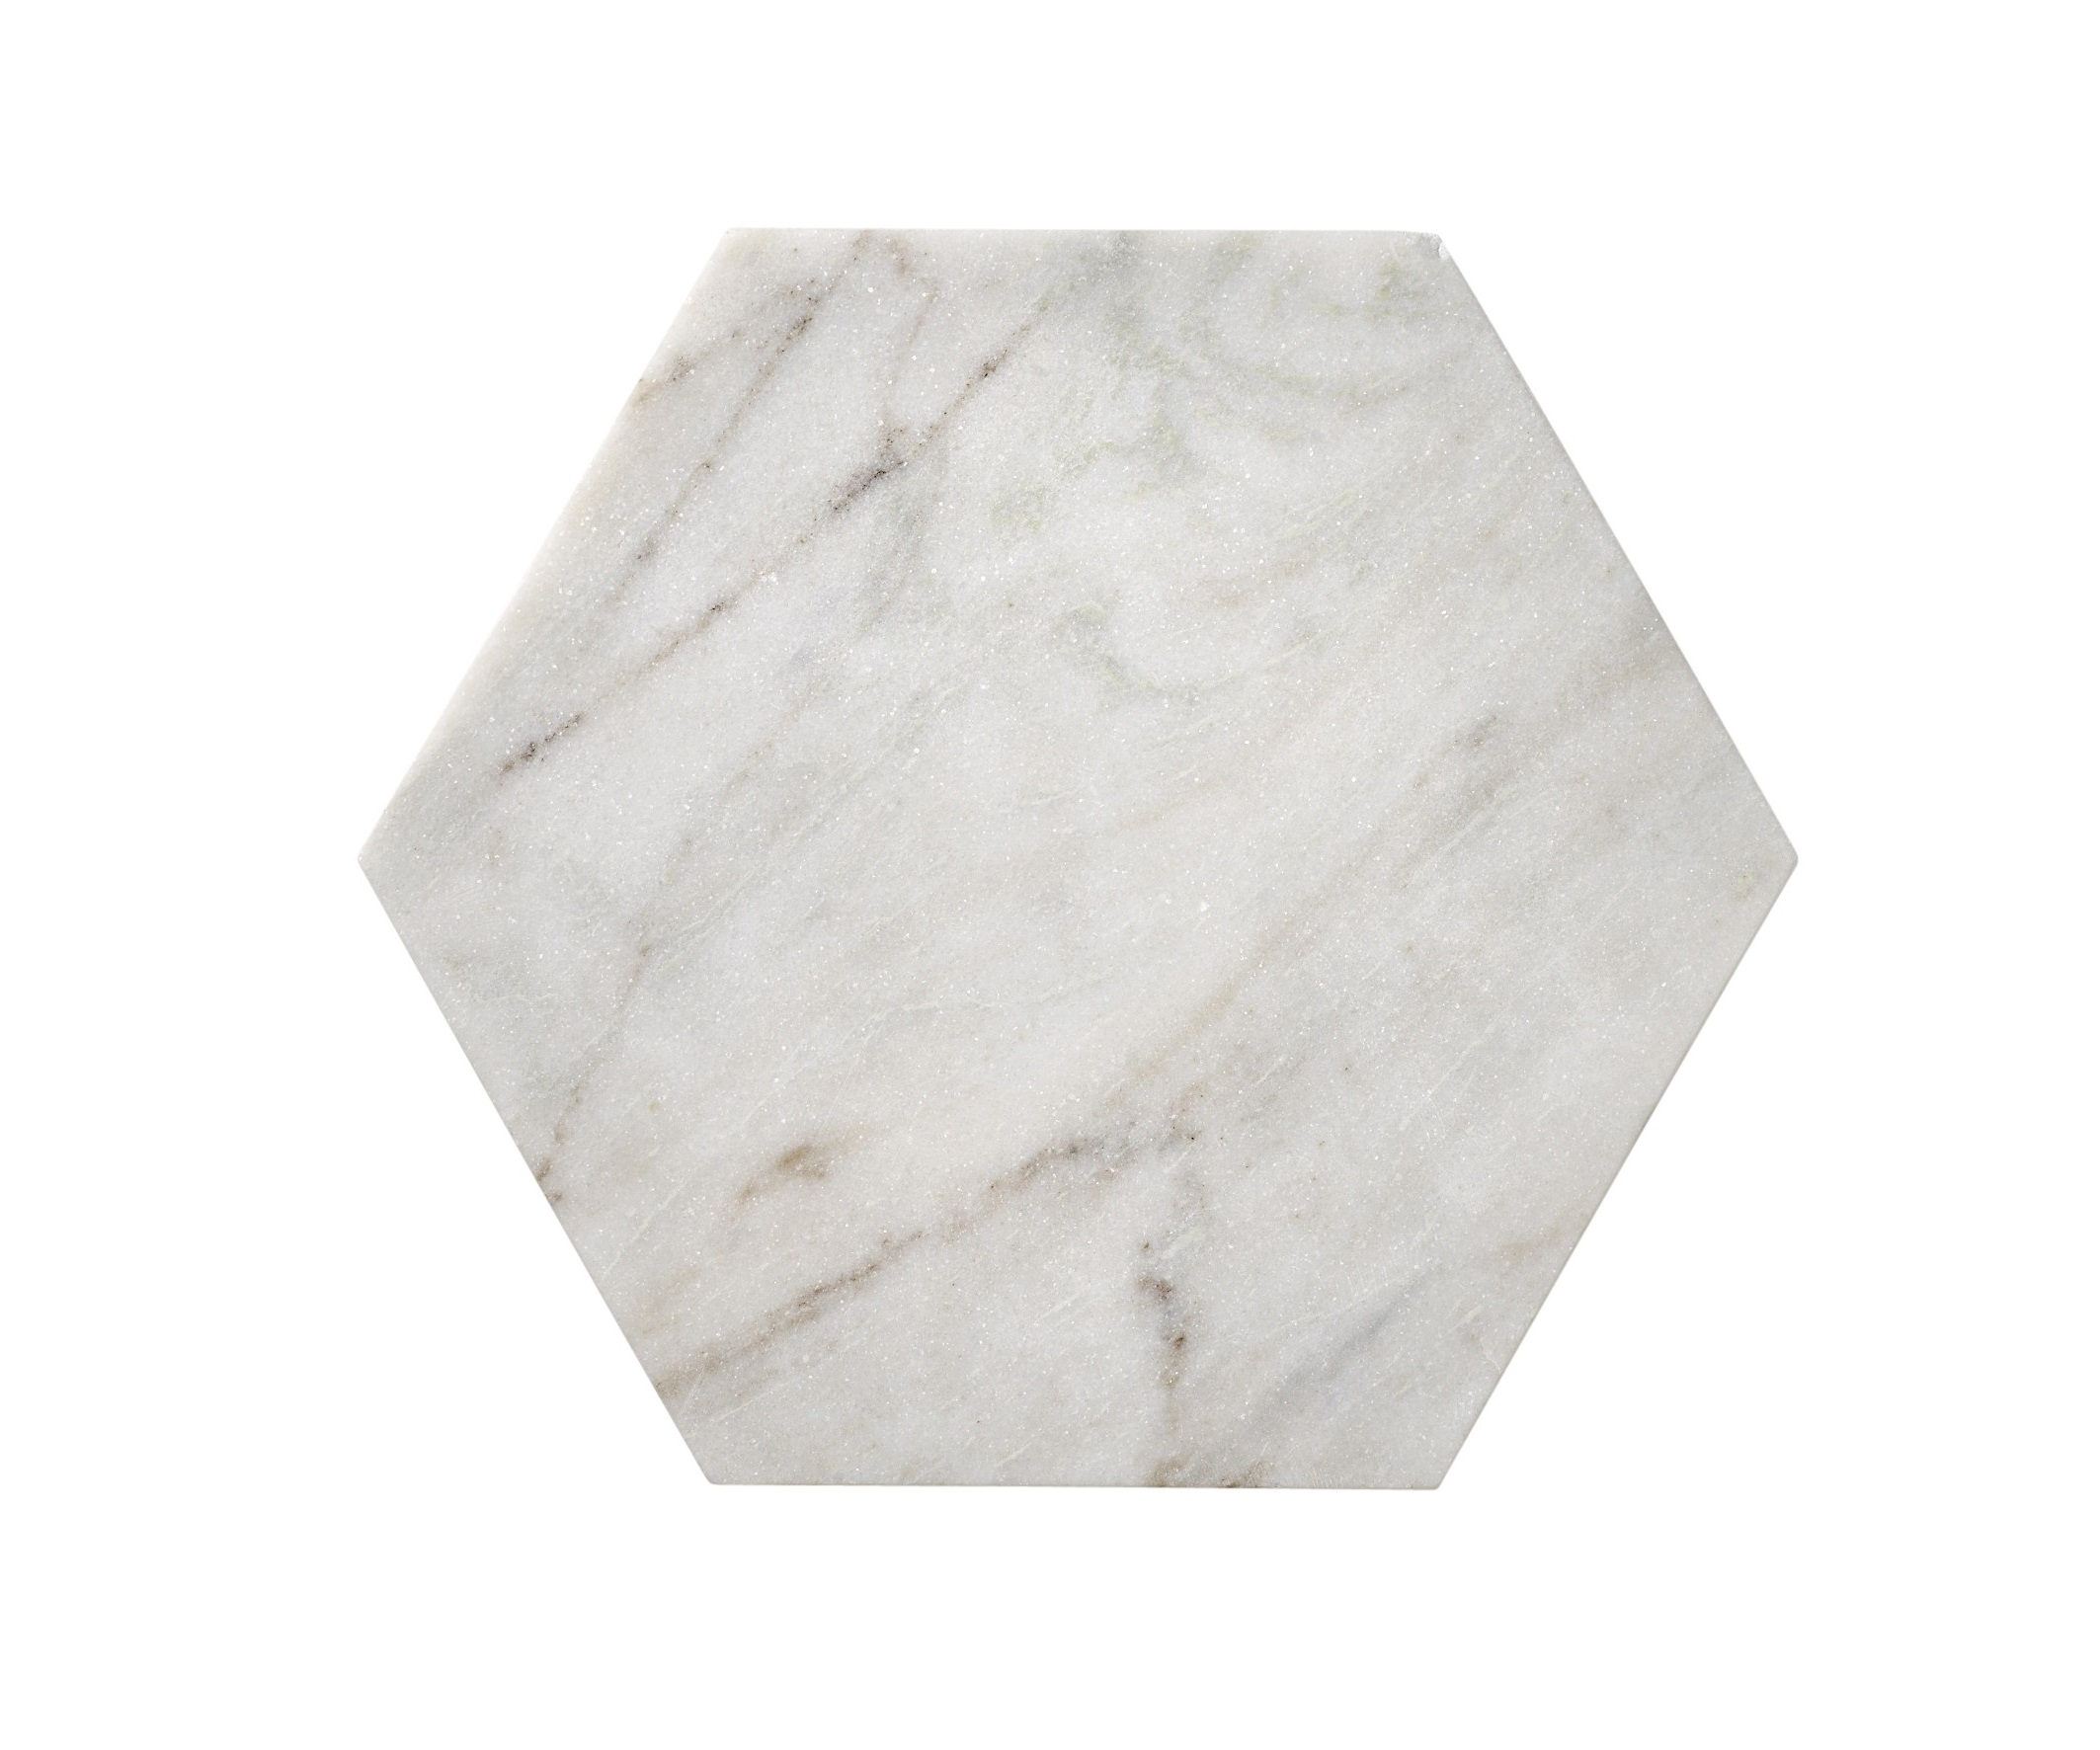 Подставка MarbleПодставки и доски<br><br><br>Material: Мрамор<br>Высота см: 1.5